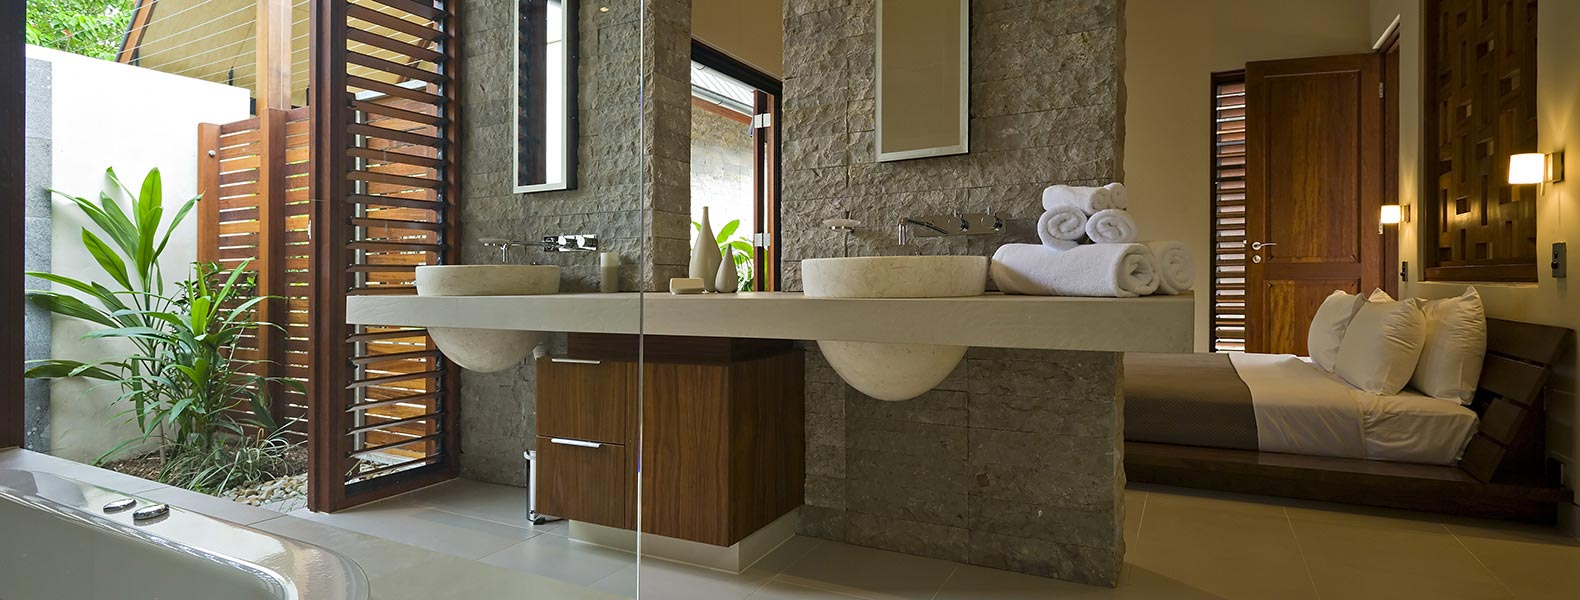 Niramaya-bed-bath